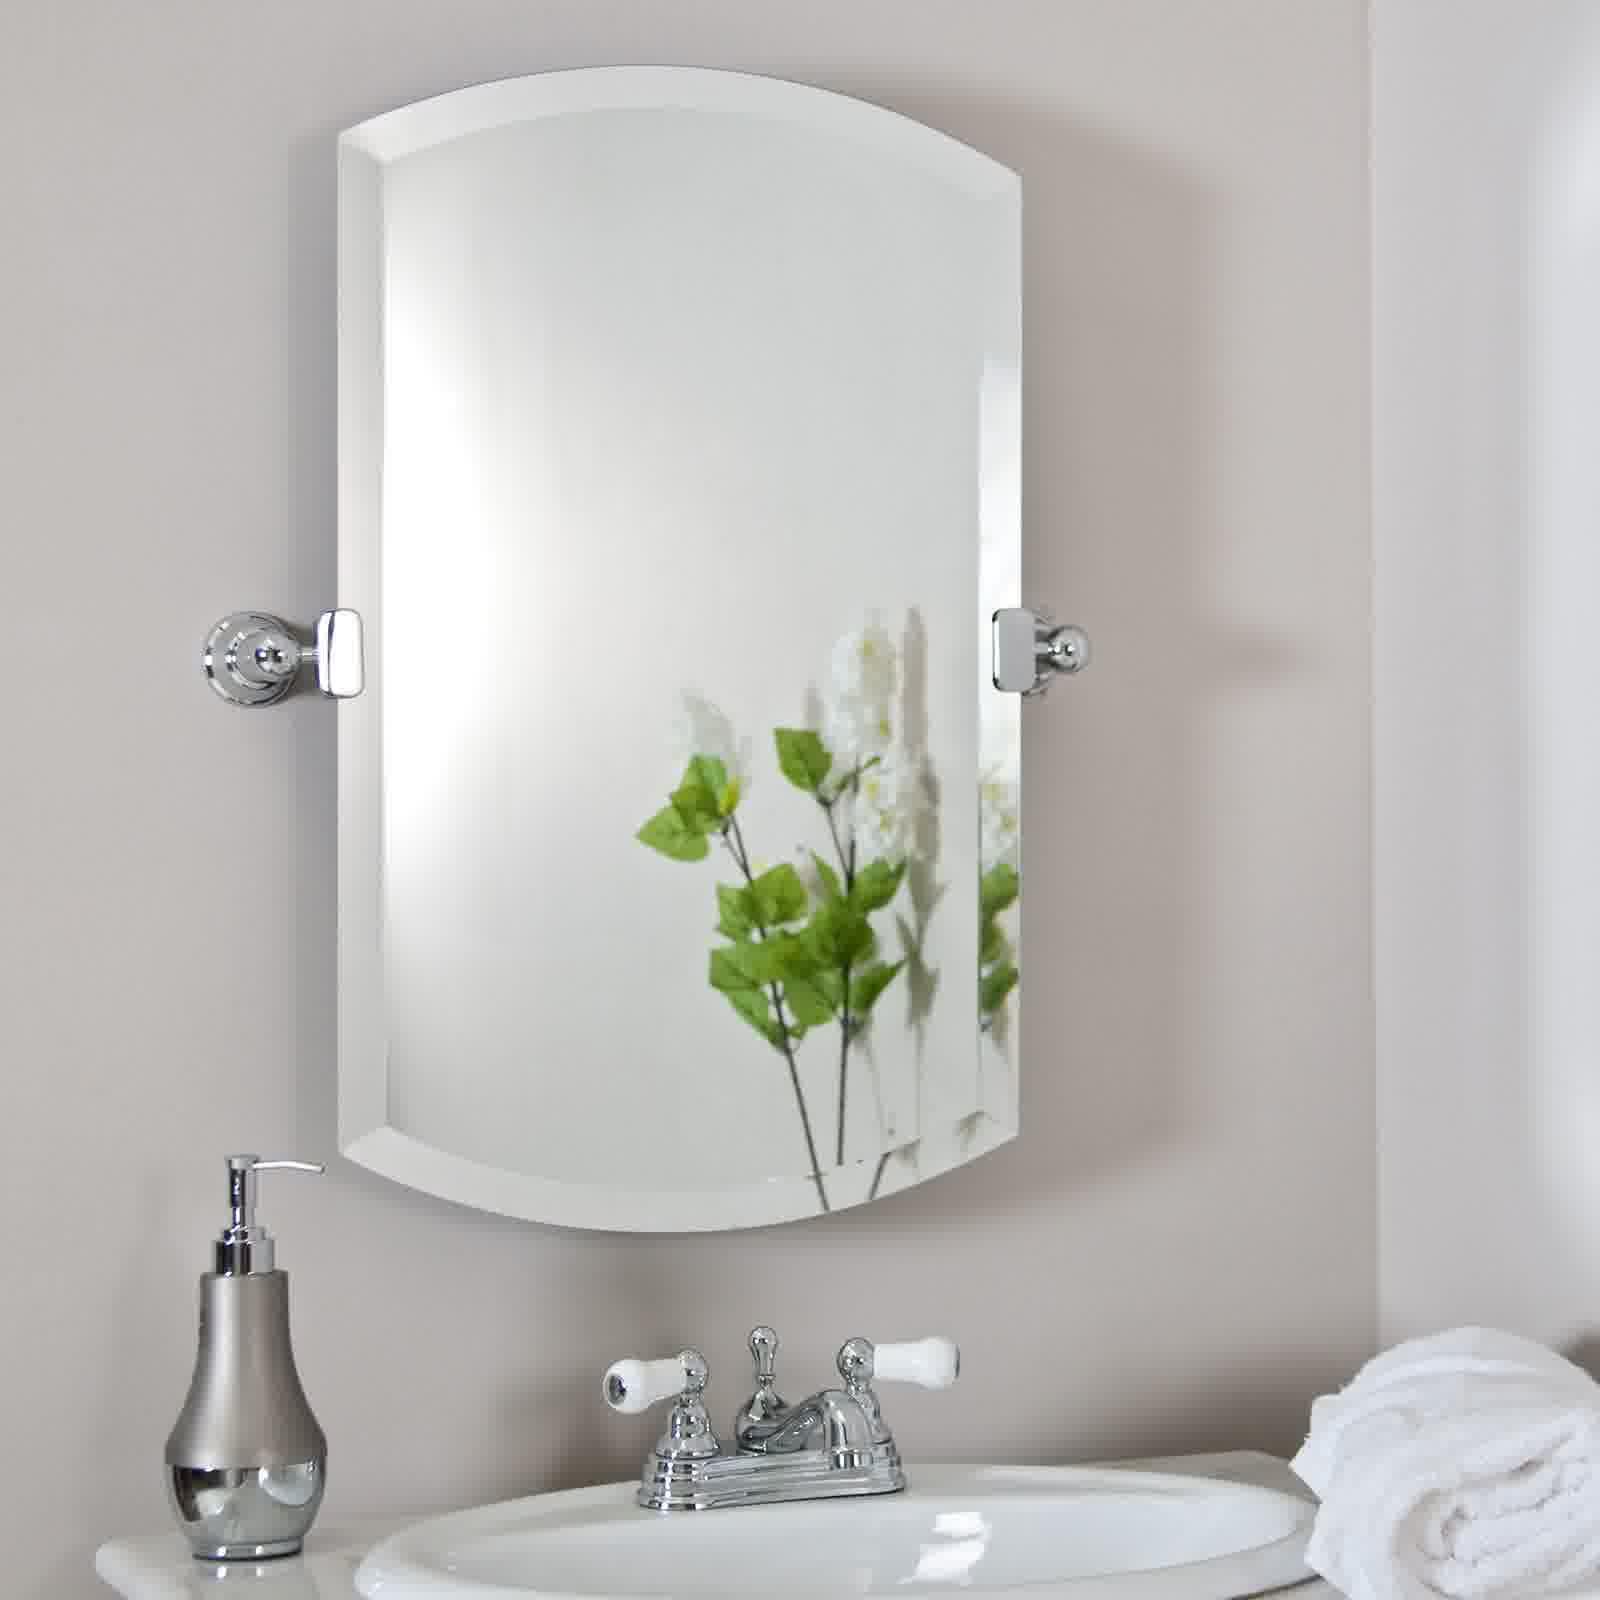 Elegant bathroom mirror